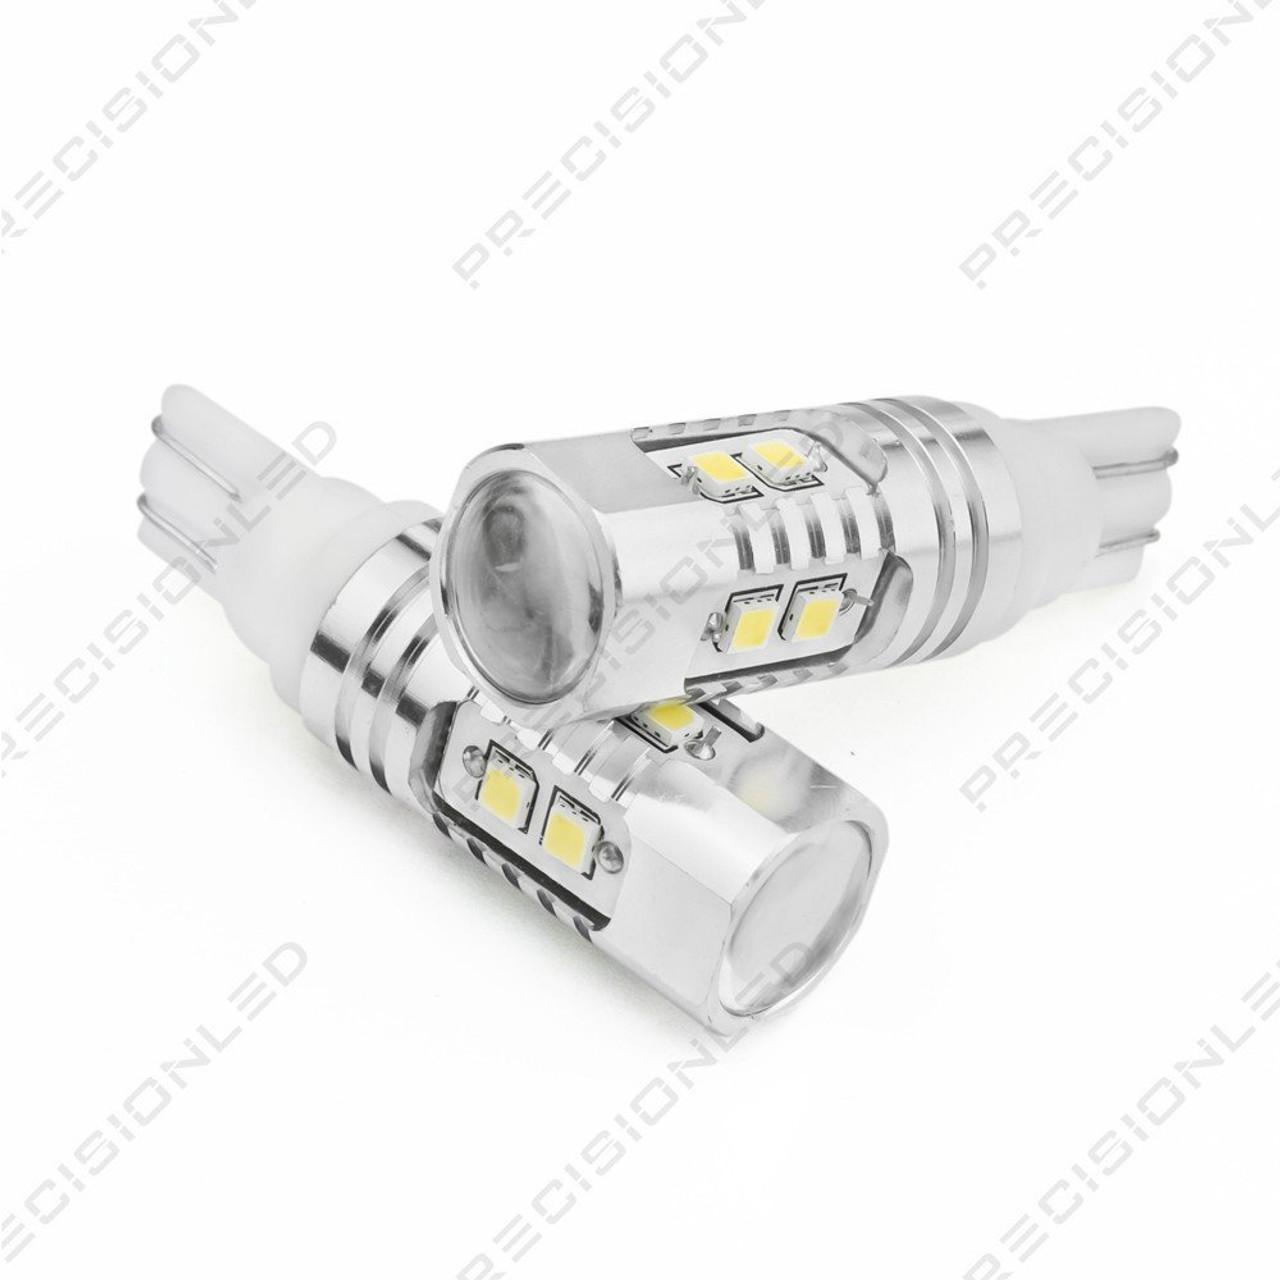 Nissan Maxima LED Backup Reverse Lights (1995-1999)